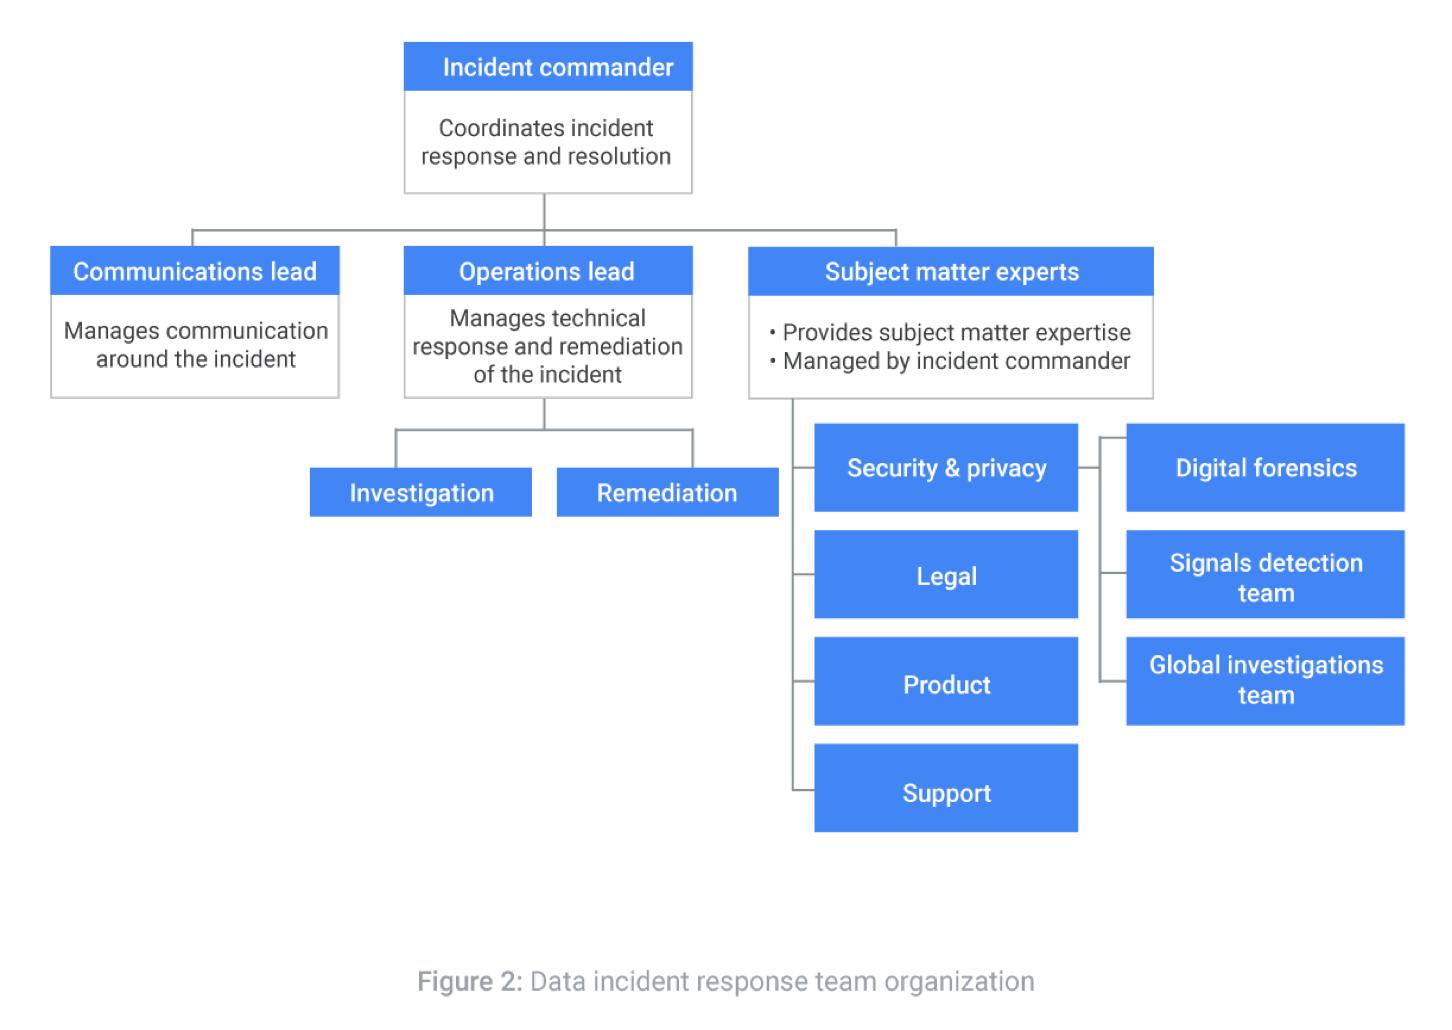 Data incident response team organization